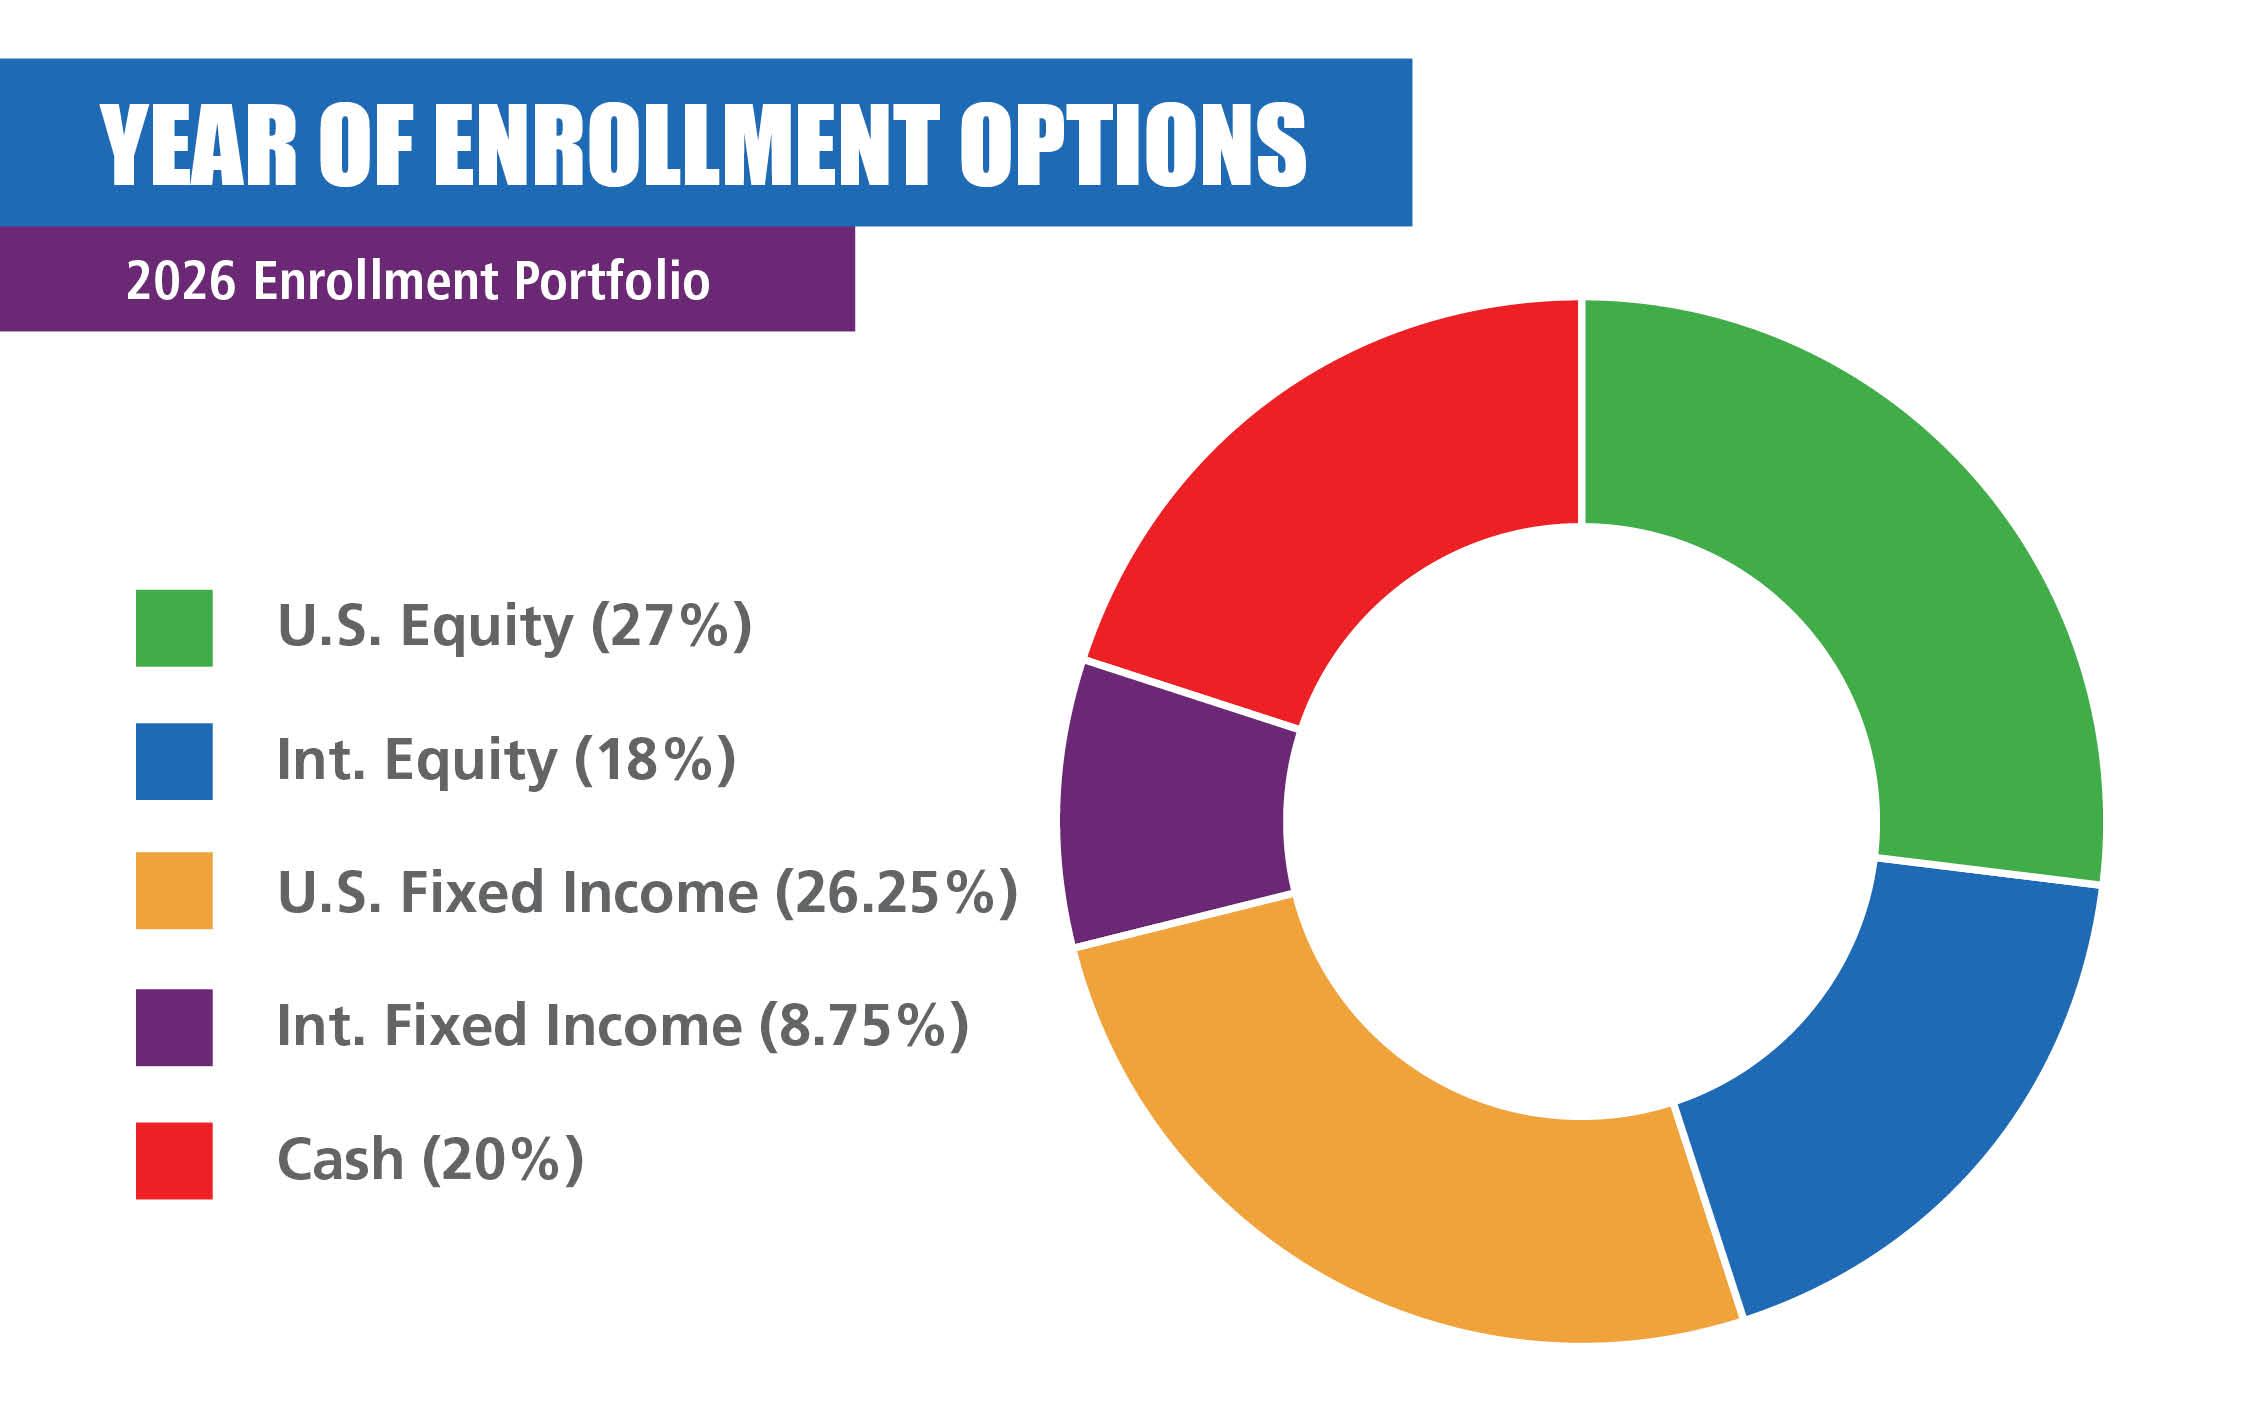 2026 Enrollment Portfolio